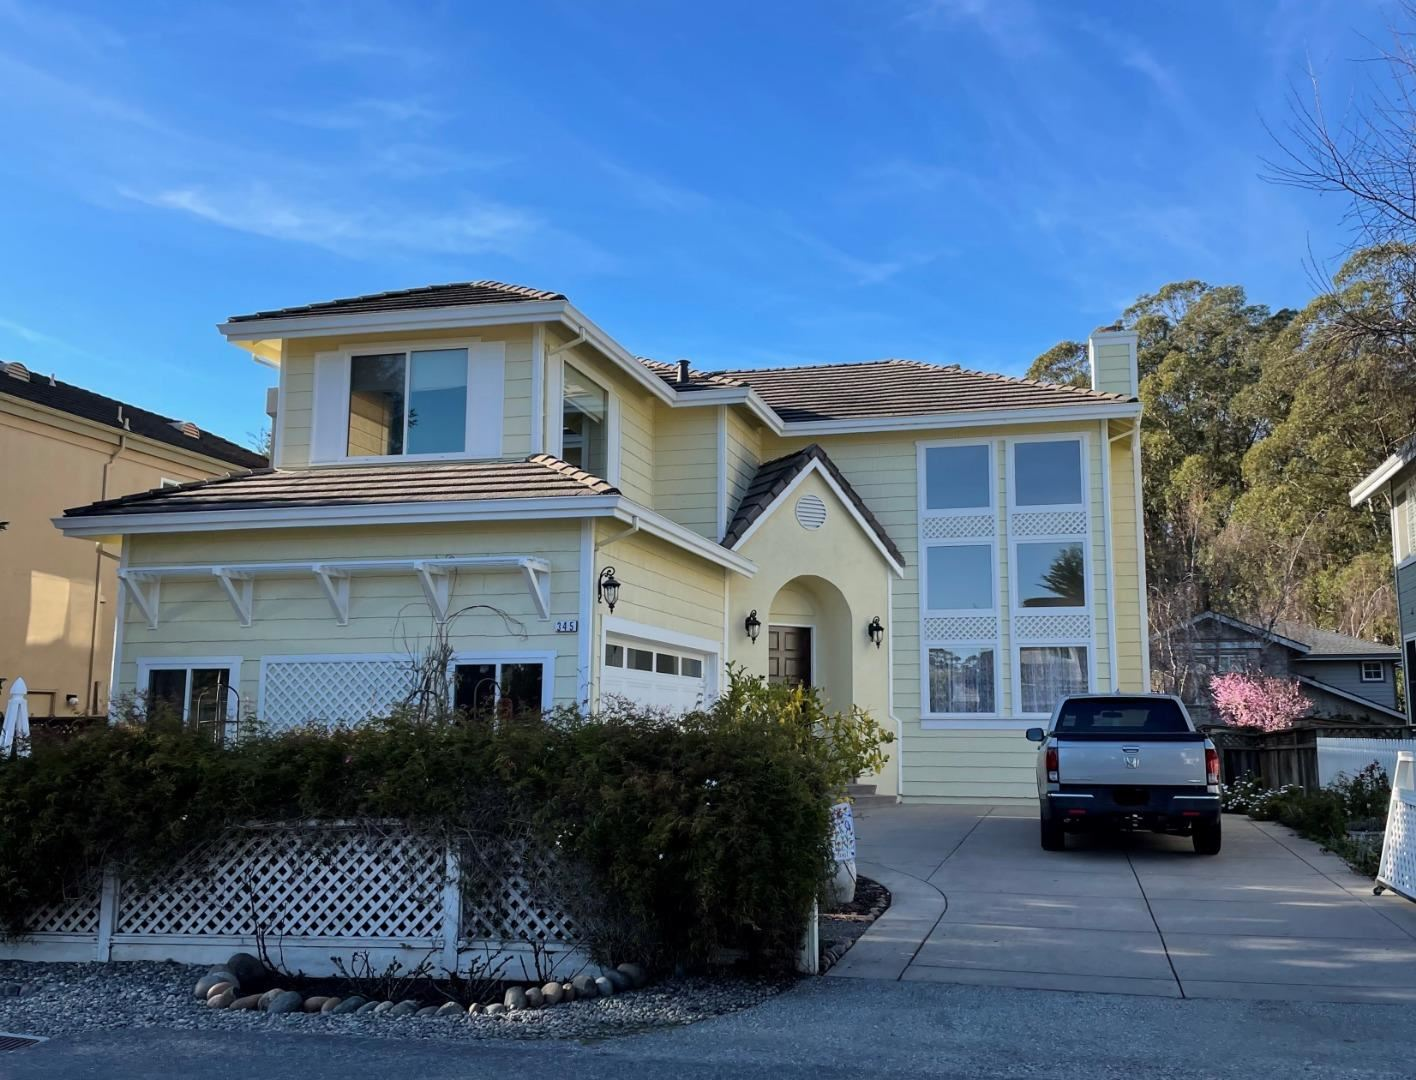 Photo for 345 Coronado AVE, HALF MOON BAY, CA 94019 (MLS # ML81828504)